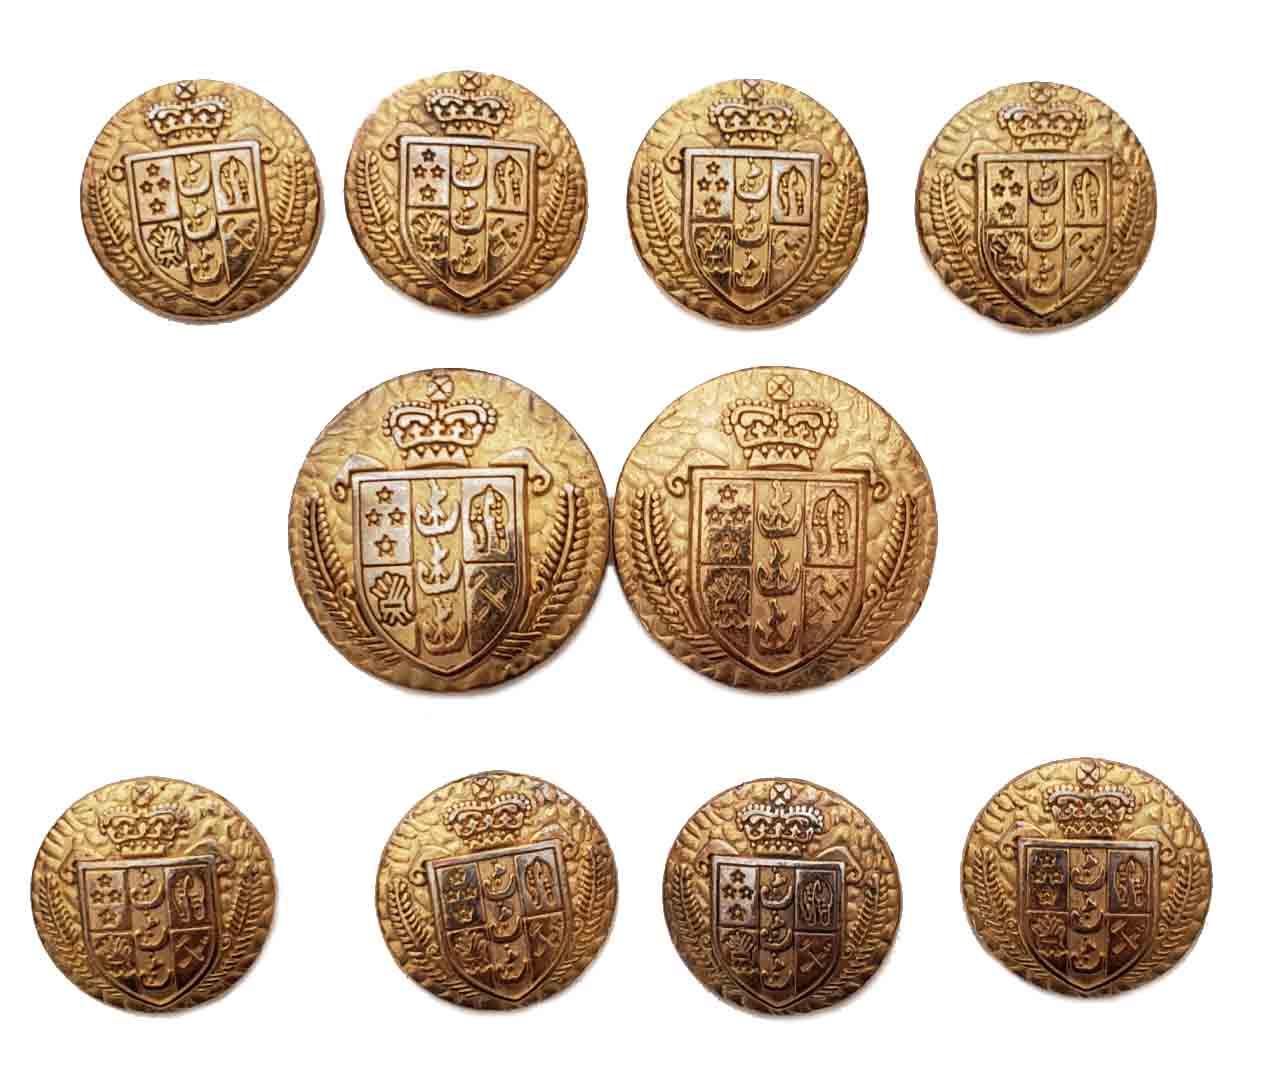 Vintage Aquascutum Blazer Buttons Set Brass Alloy Gold Silver Crown Shield Shank Men's